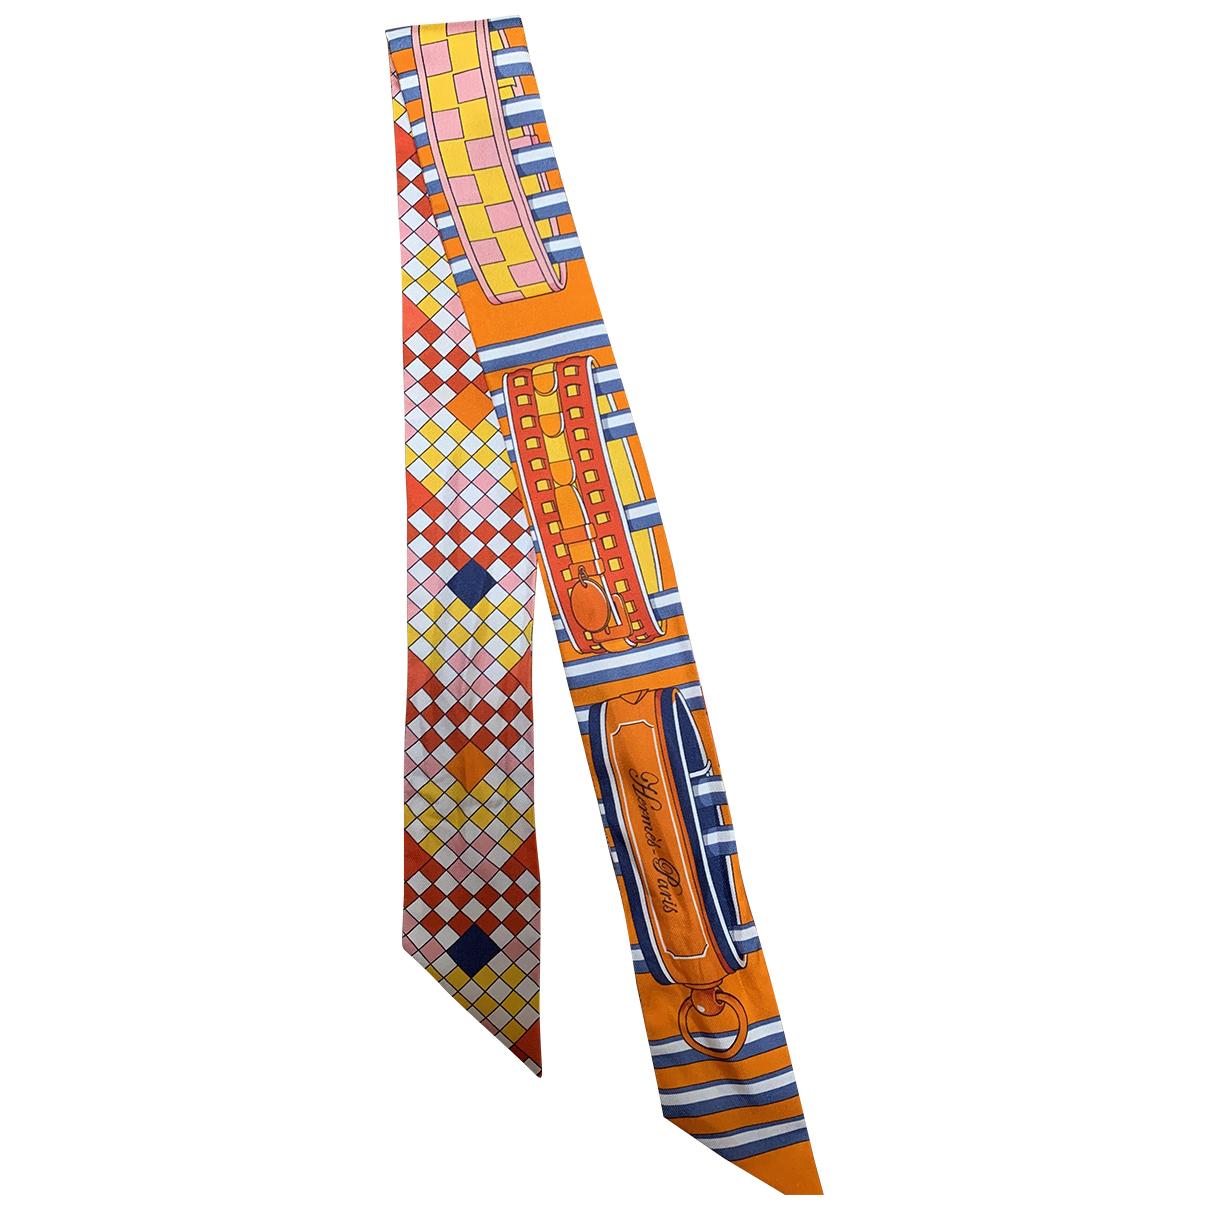 Hermes - Foulard Twilly 86 pour femme en soie - orange